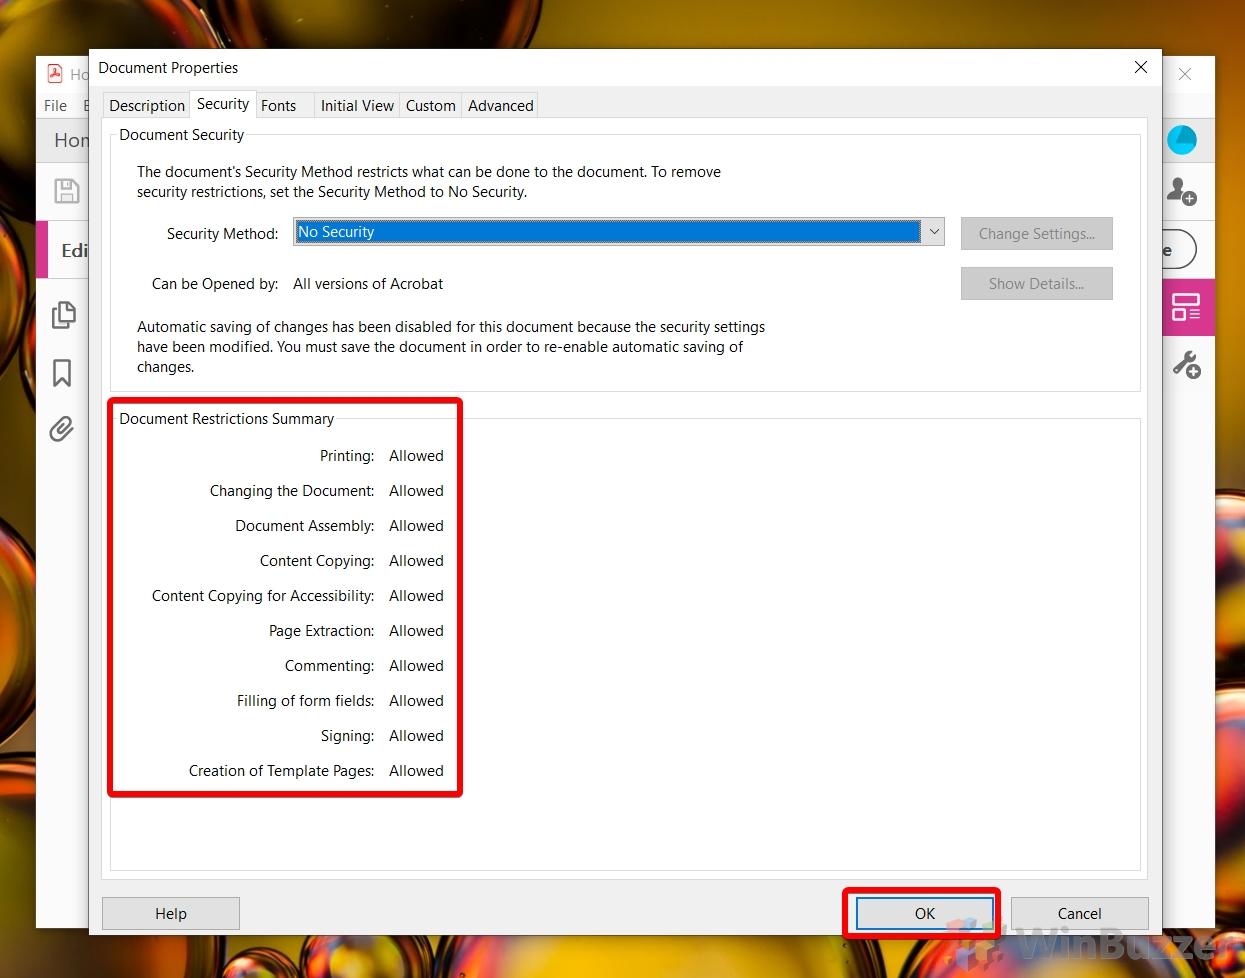 Windows 10 Adobe Acrobat Pro DC - Security Settings - Document Permissions